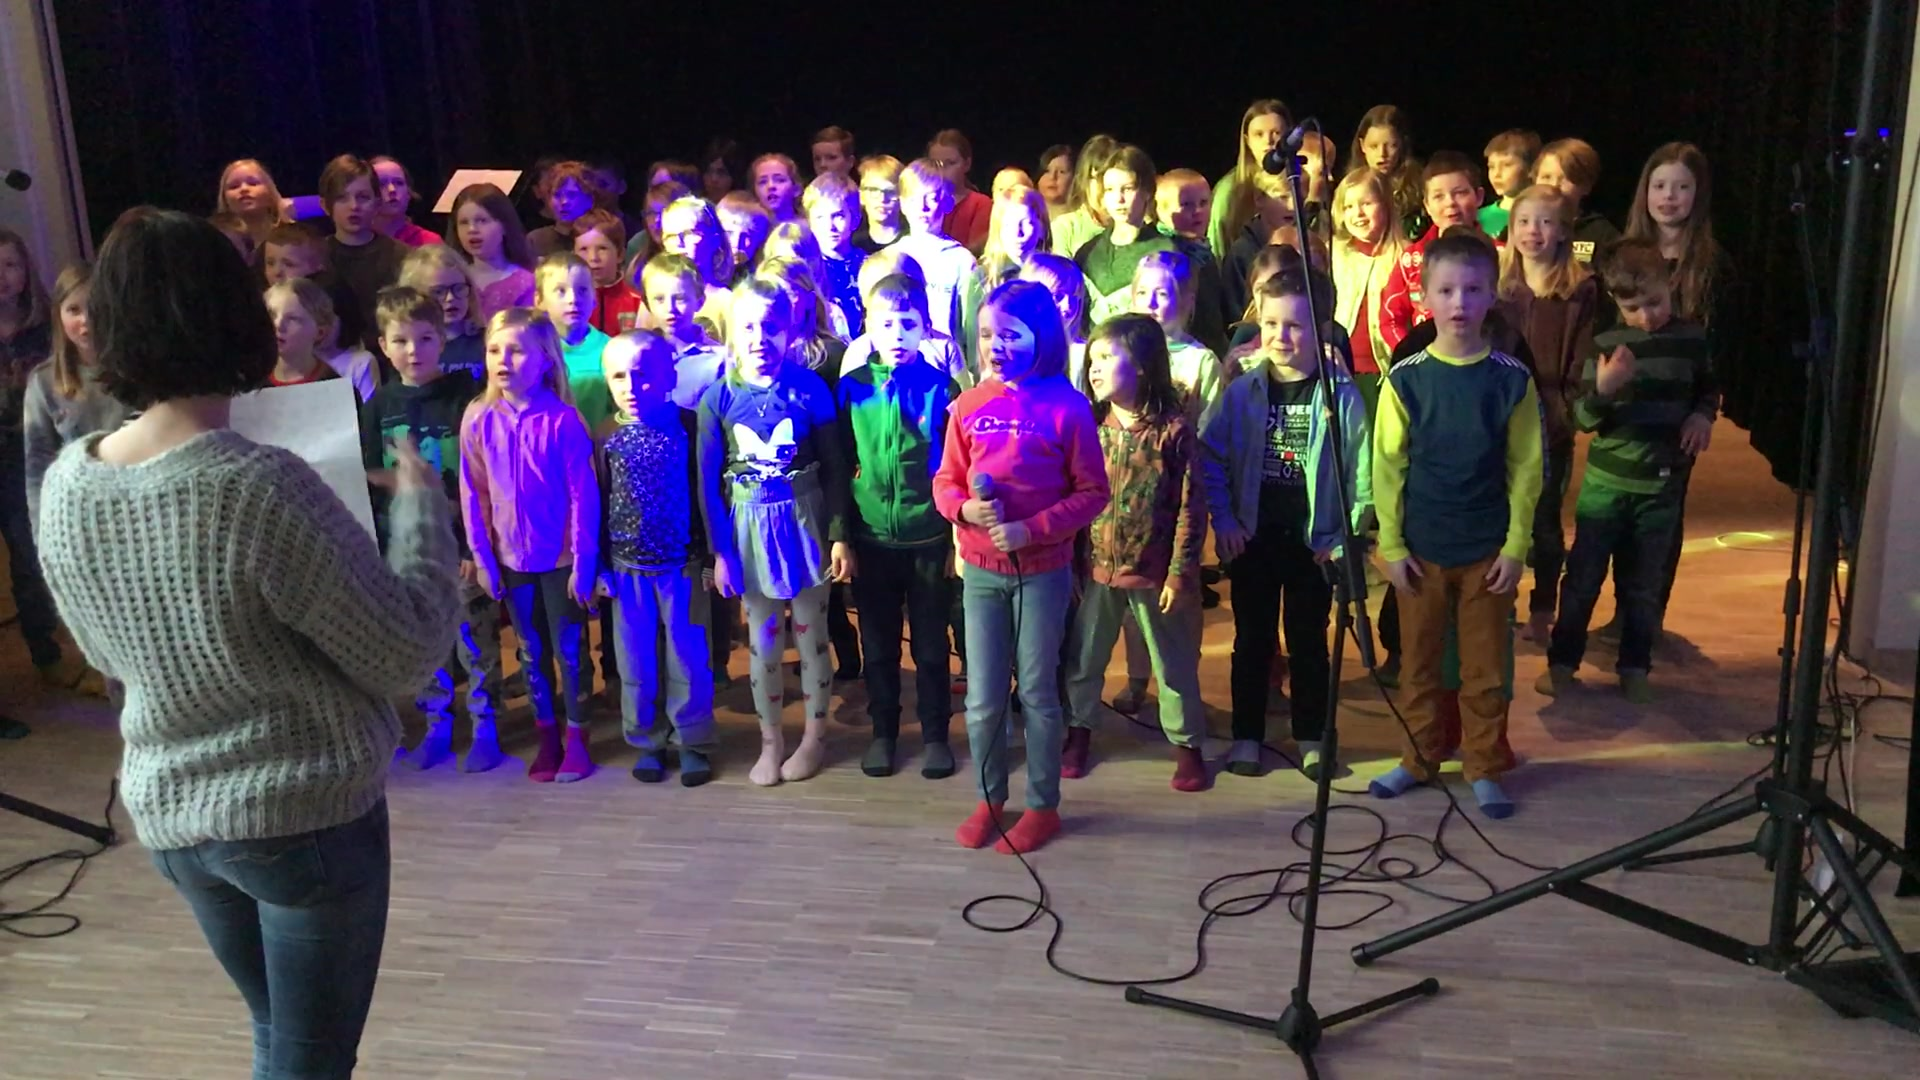 Valnesfjord barnekor feirer nyskolen